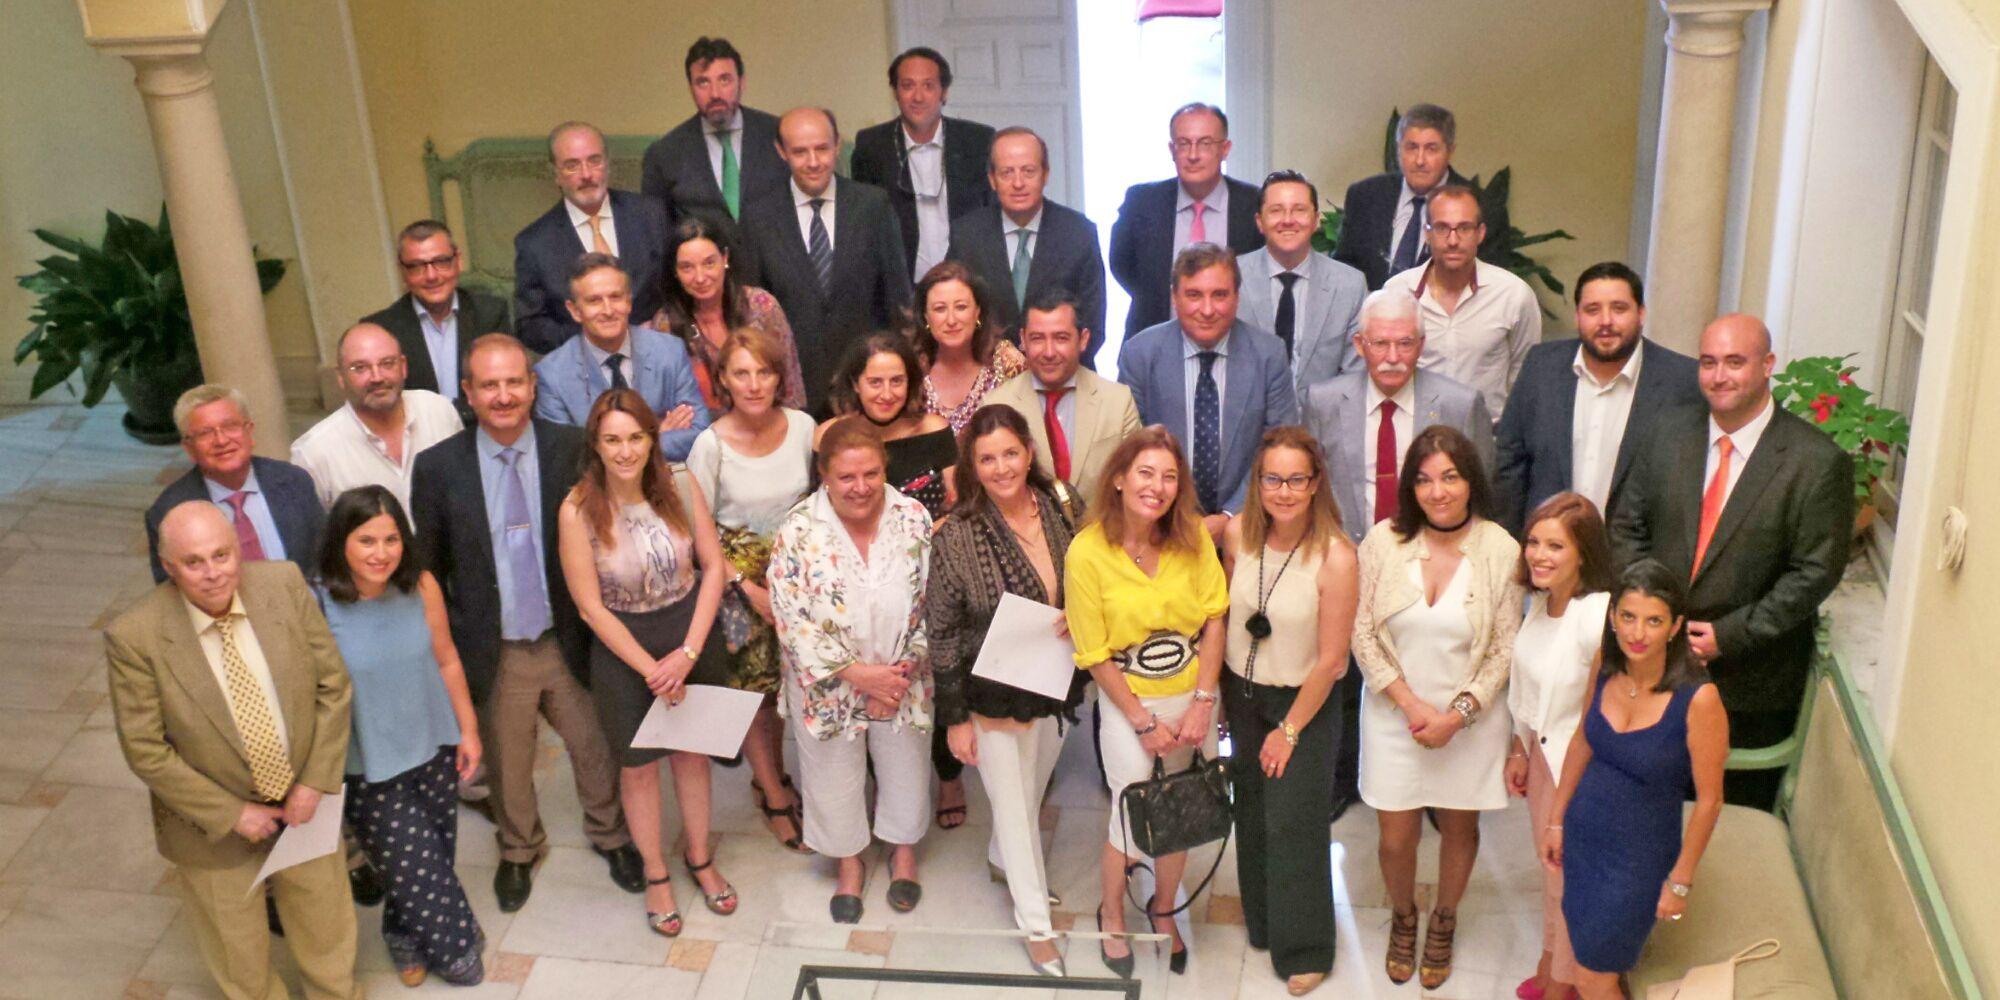 Colegio de Abogados de Jerez - Entrega de Diplomas 1b facebook